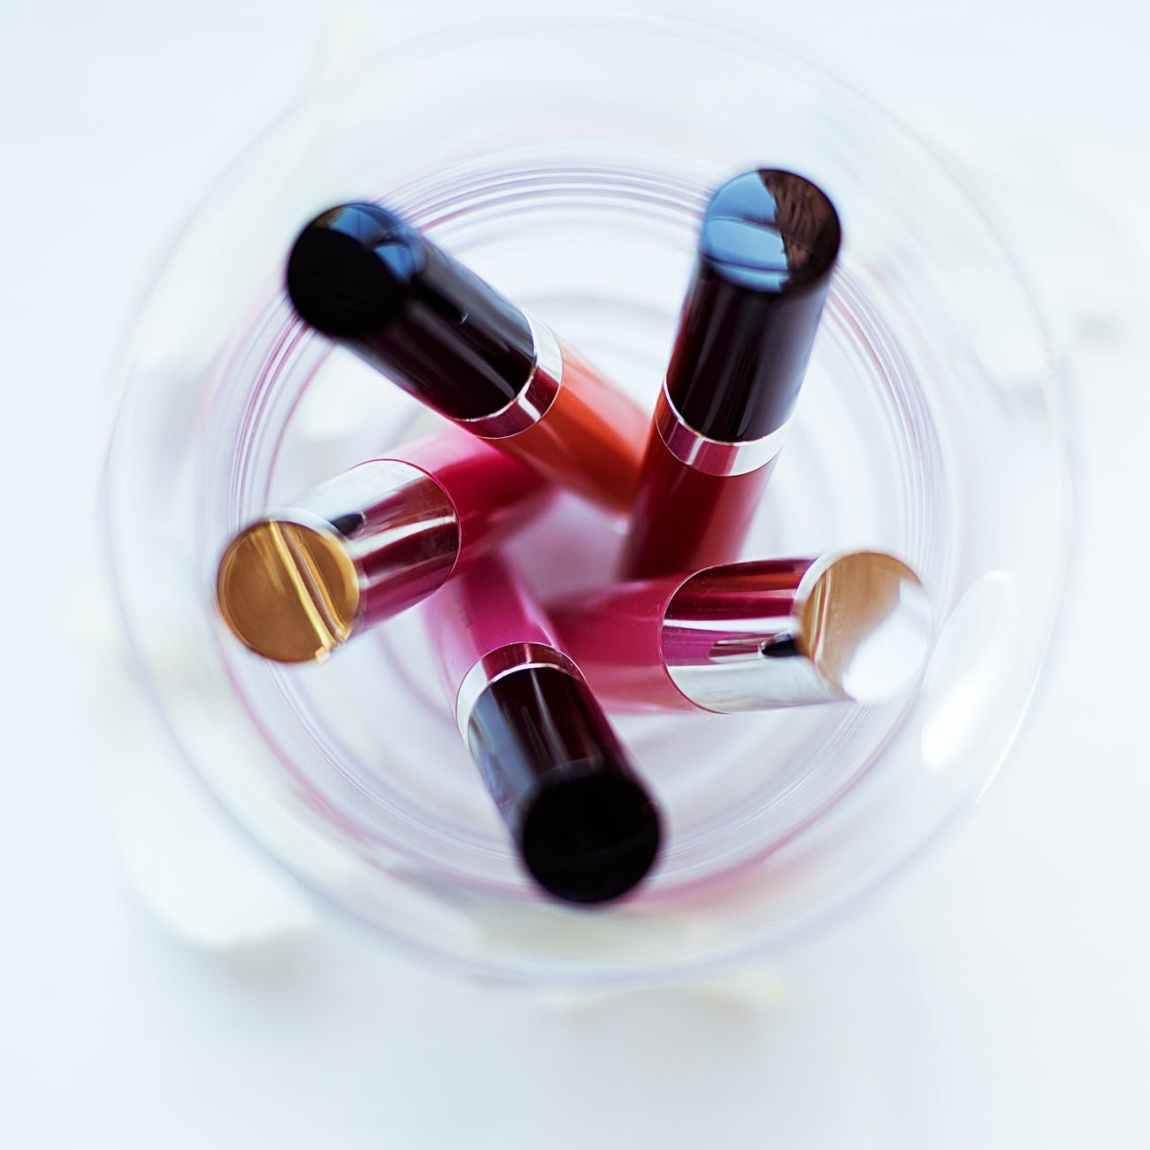 blur close up color container